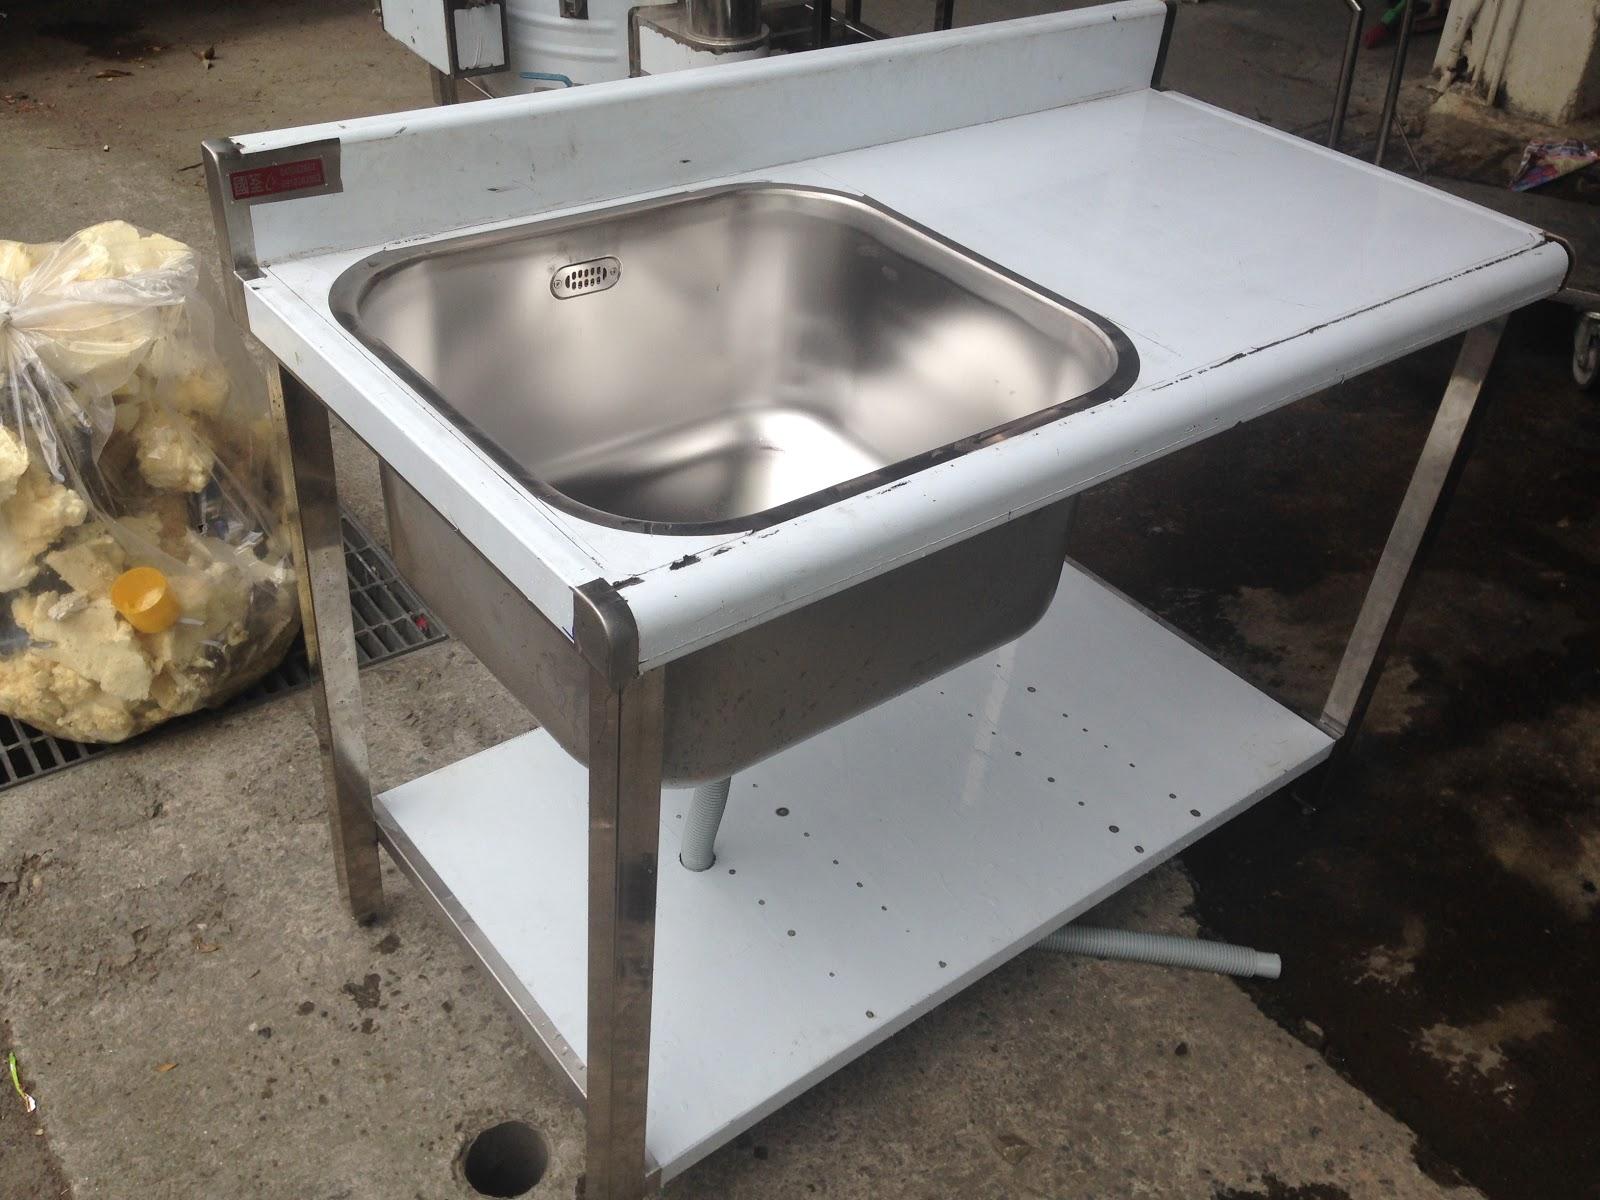 Kitchen Sink 33 X 22 Granite Table 30深水槽 左水槽 水槽加平台 深水槽 洗菜槽 厨房水槽 Nidbox 30深水槽加平台 左水槽右平台